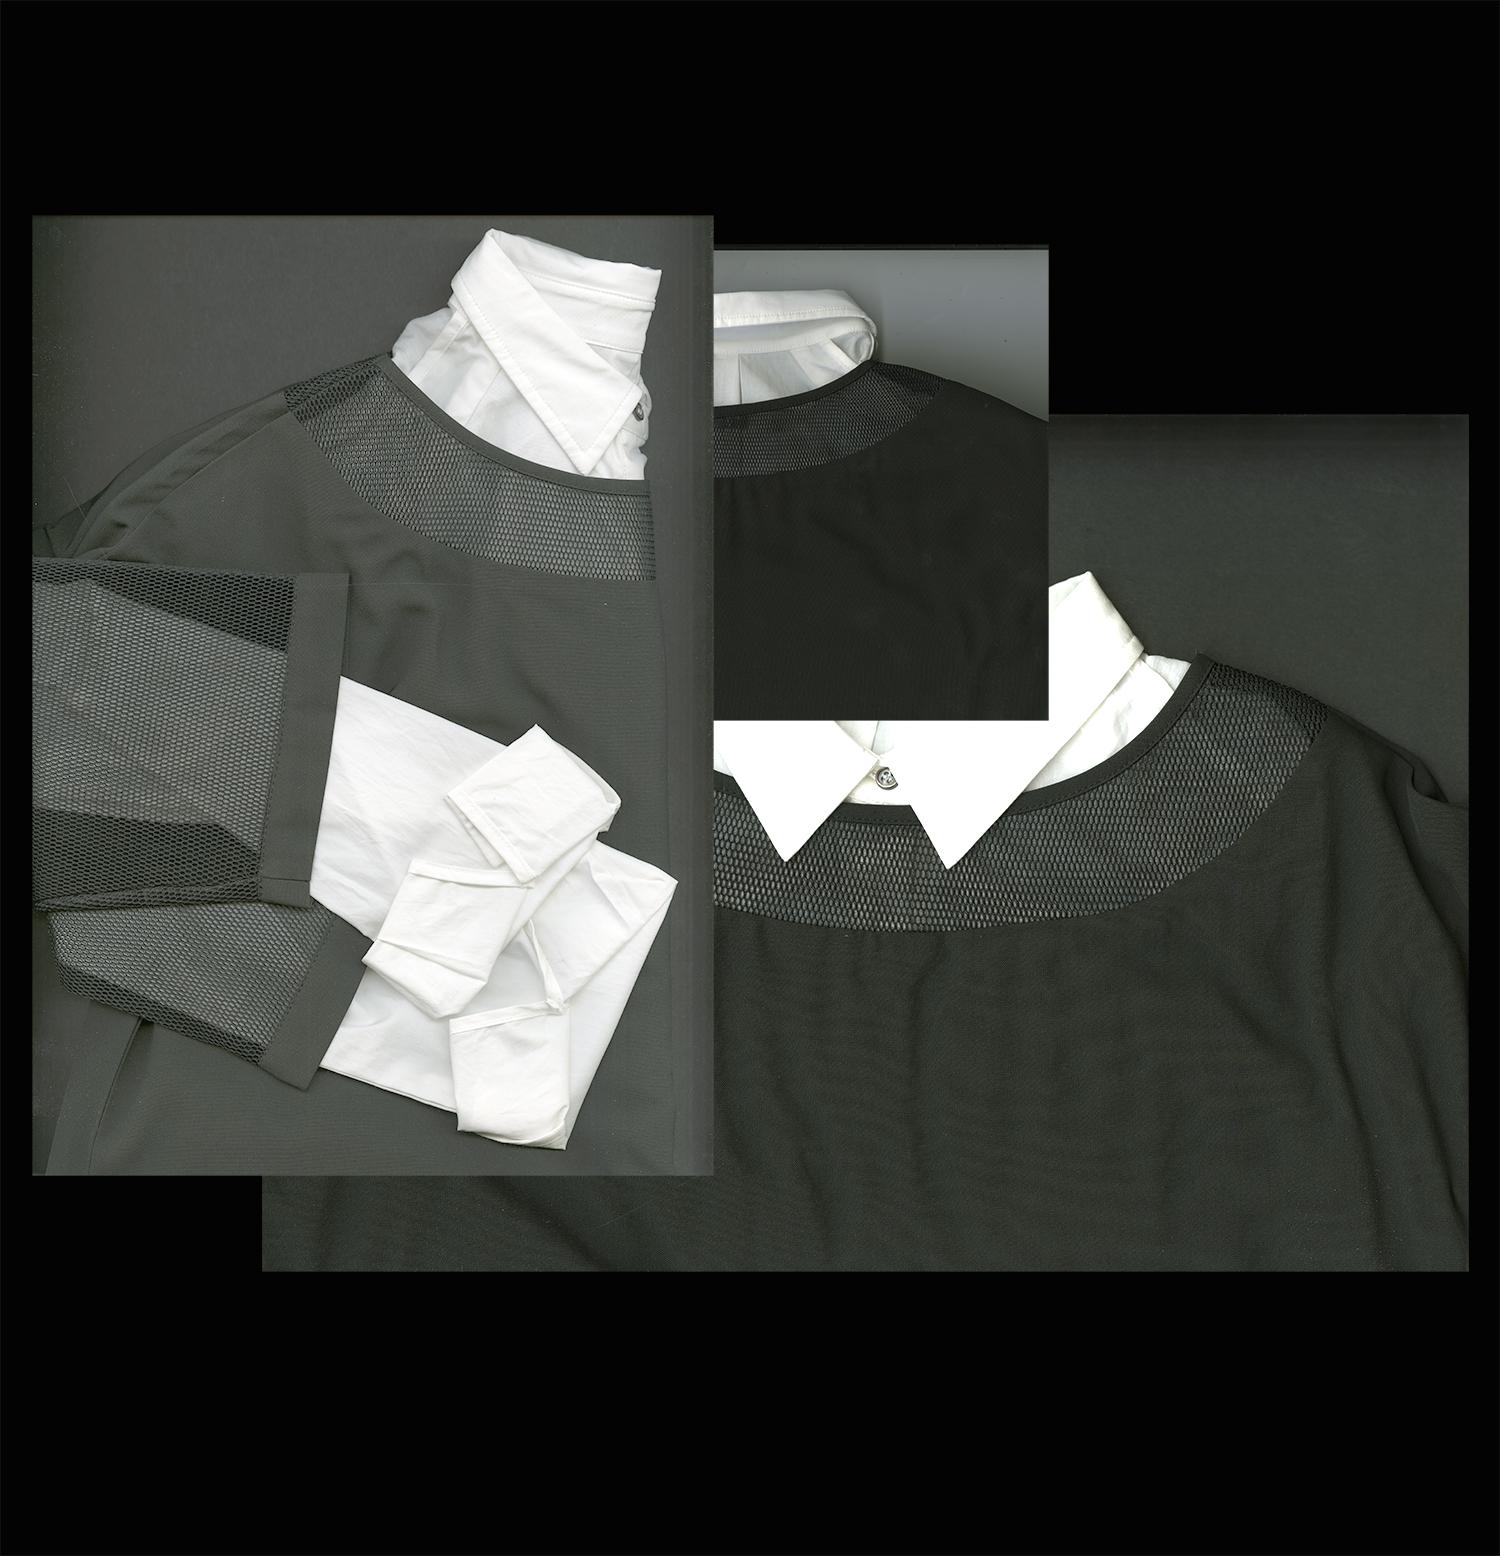 Mute by JL Black Mesh Tunic and White Collared Shirt by Joanne Lu, MFA Fashion Merchandising.